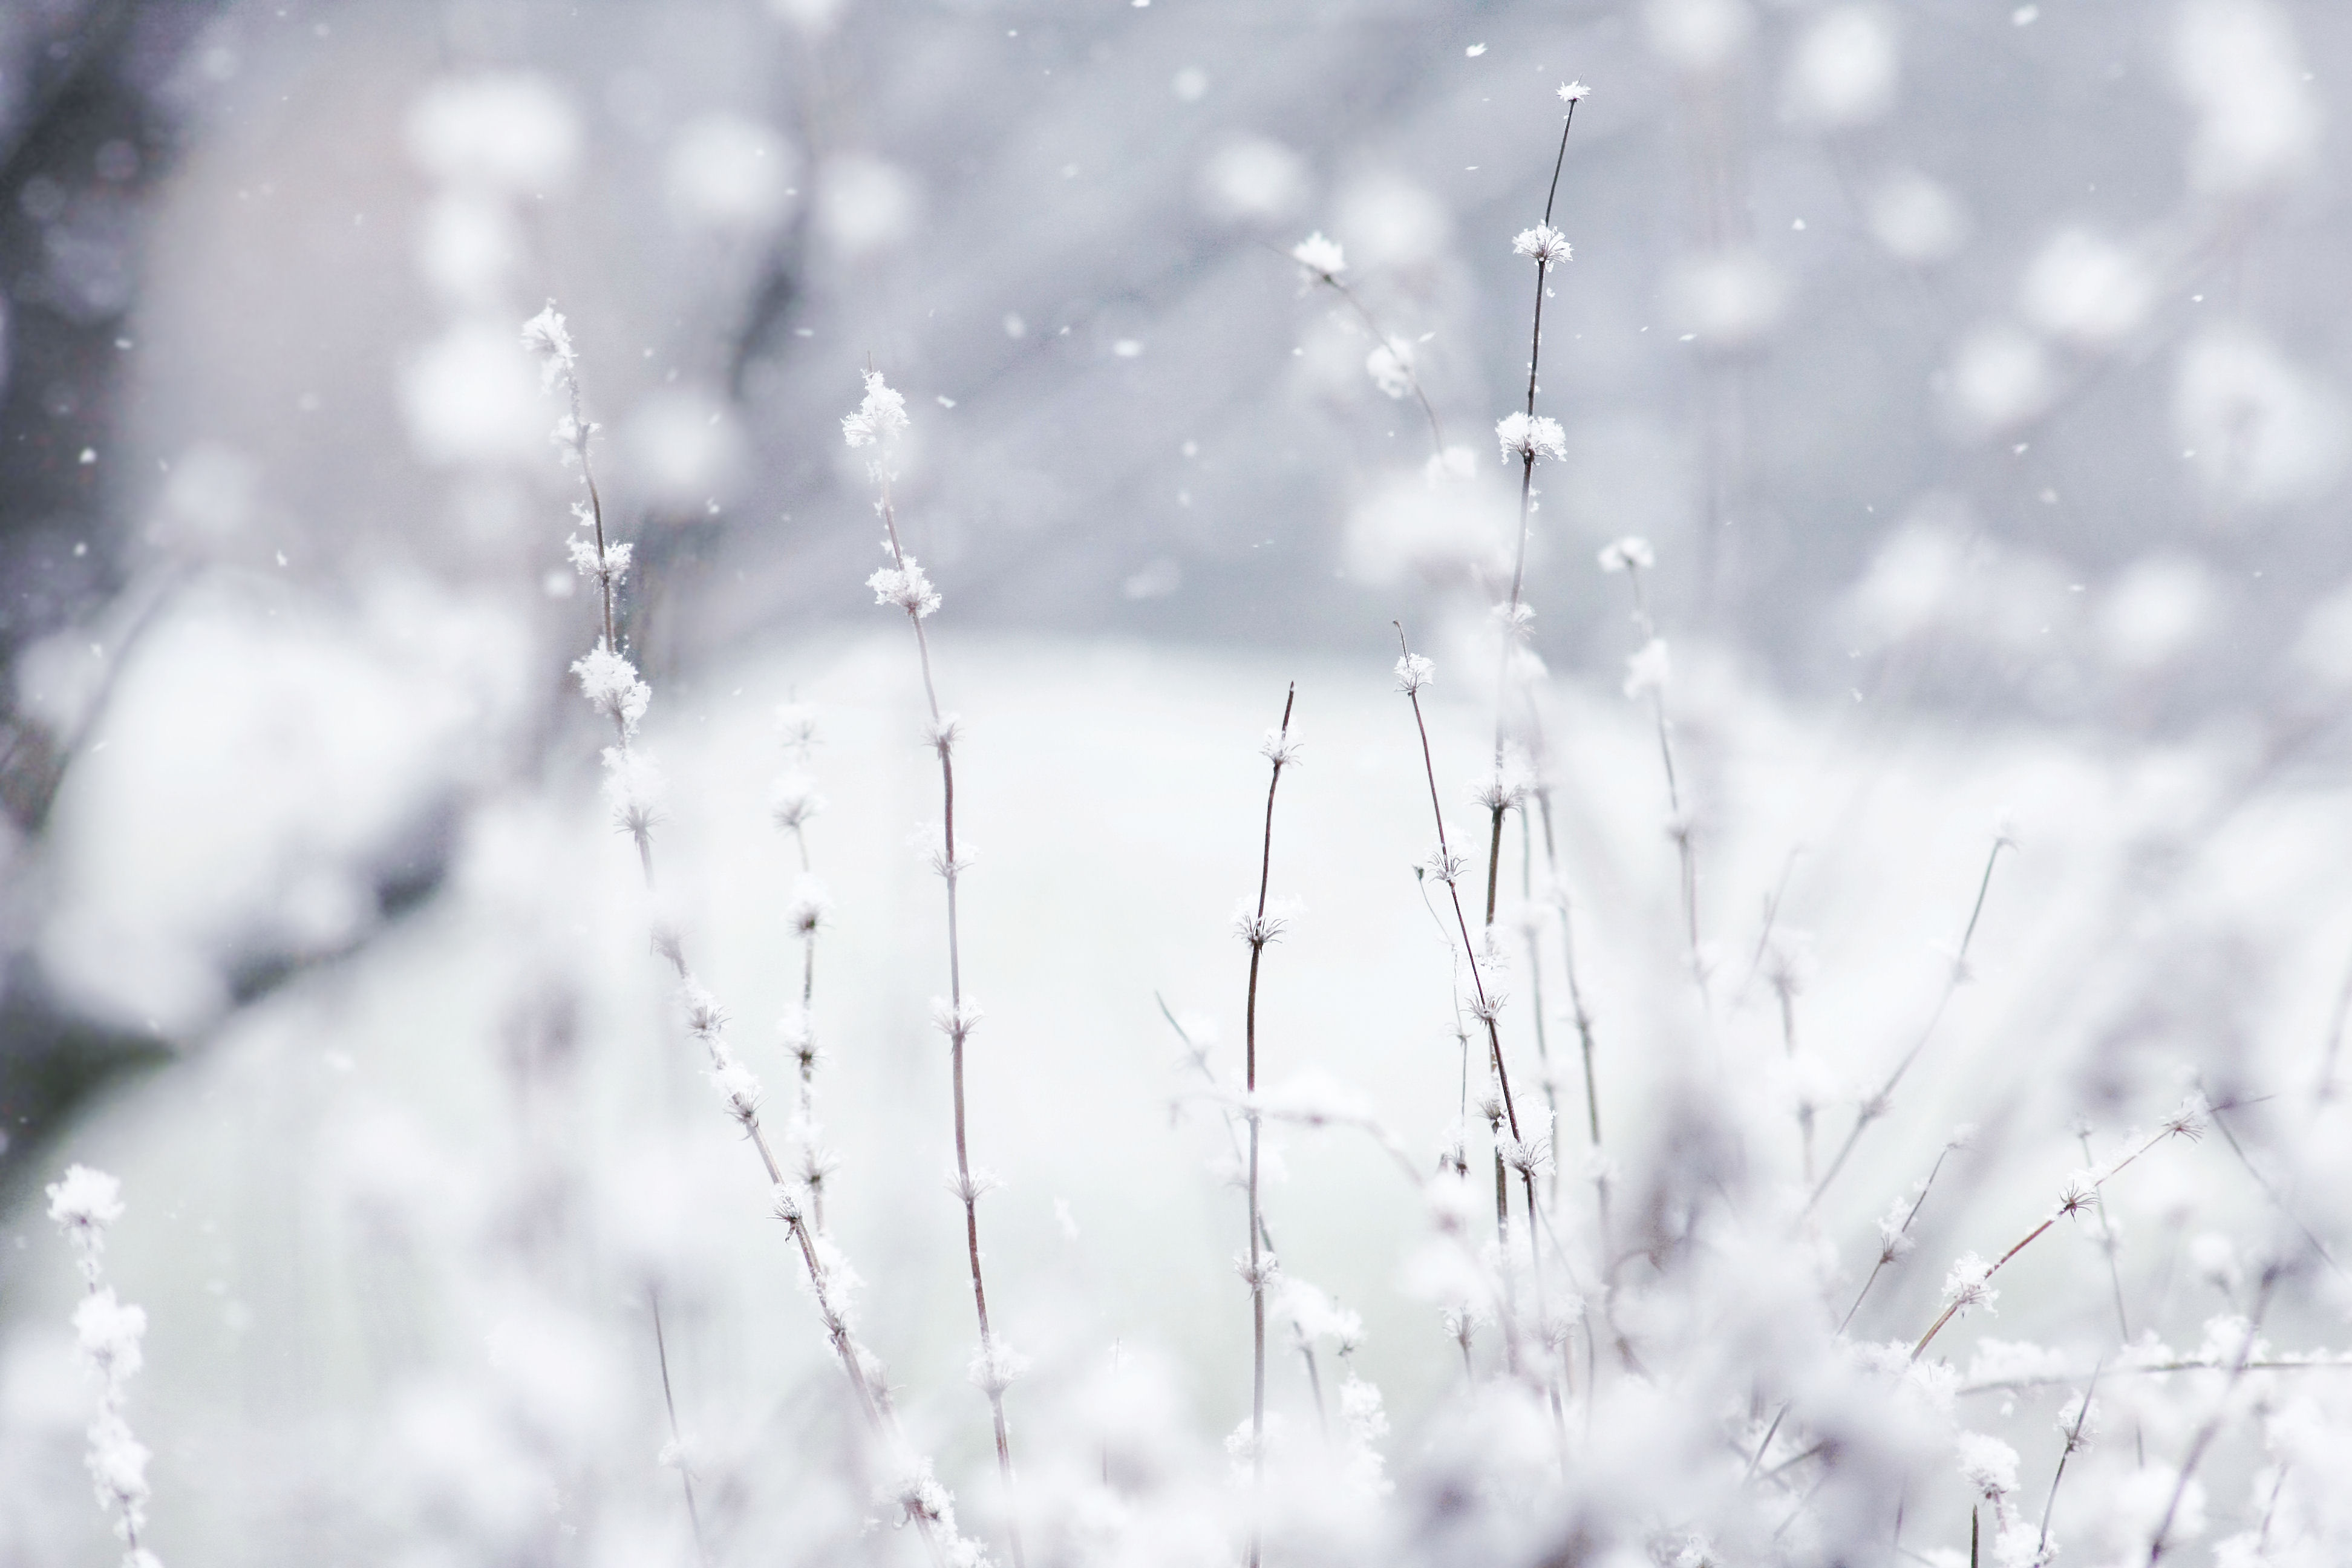 Winter Wallpaper 6795137 3888x2592